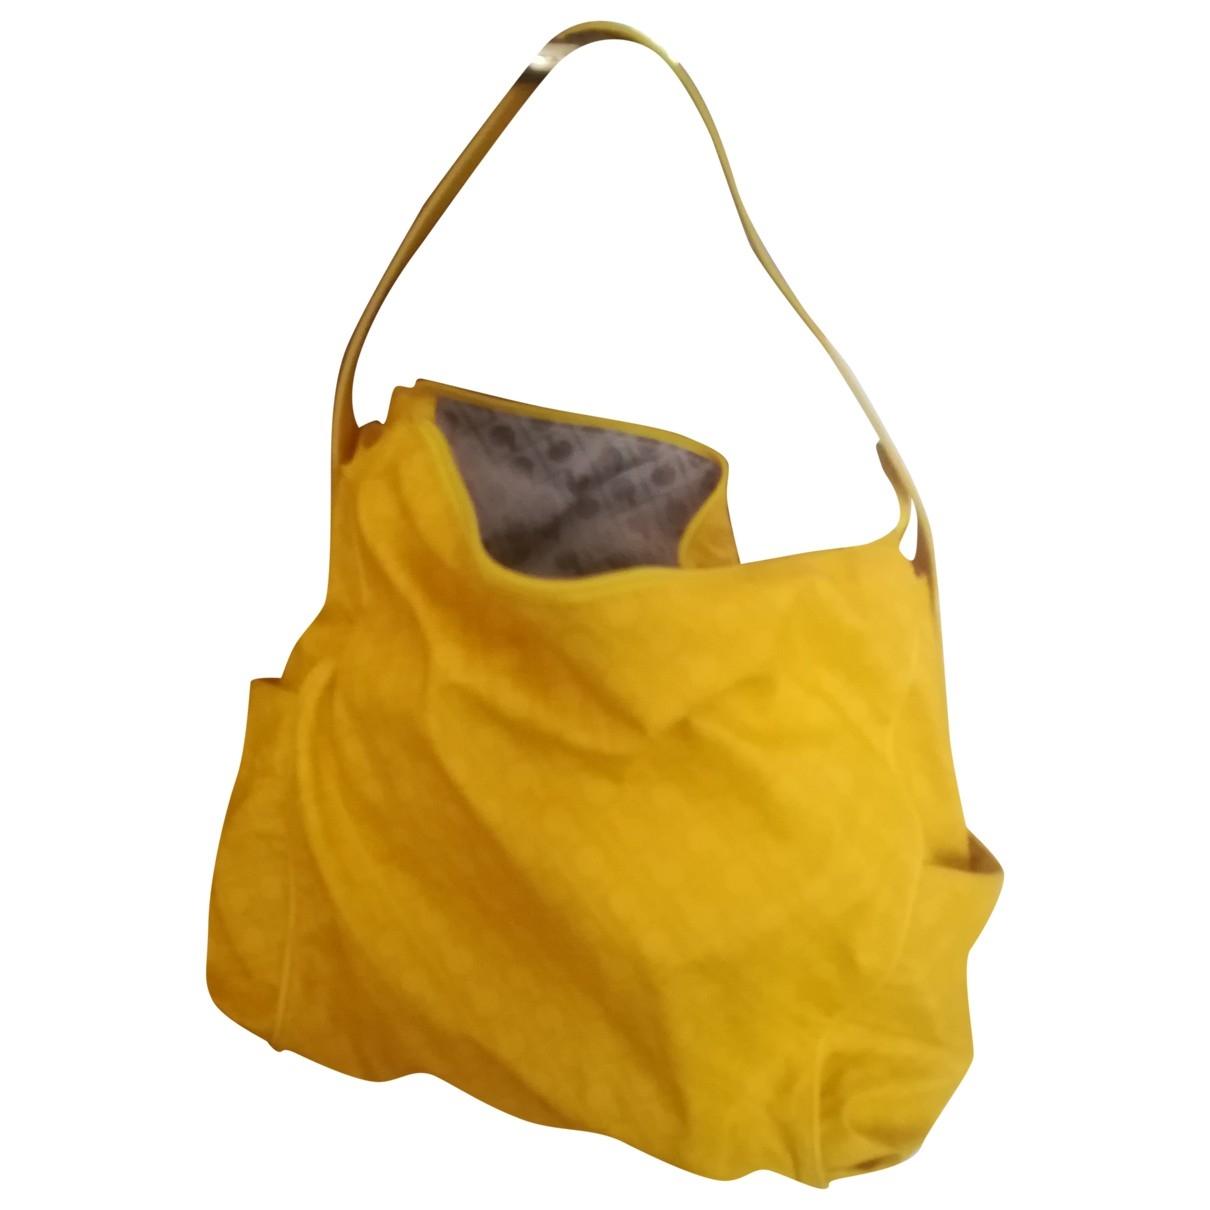 Gherardini - Sac a main   pour femme en toile - jaune